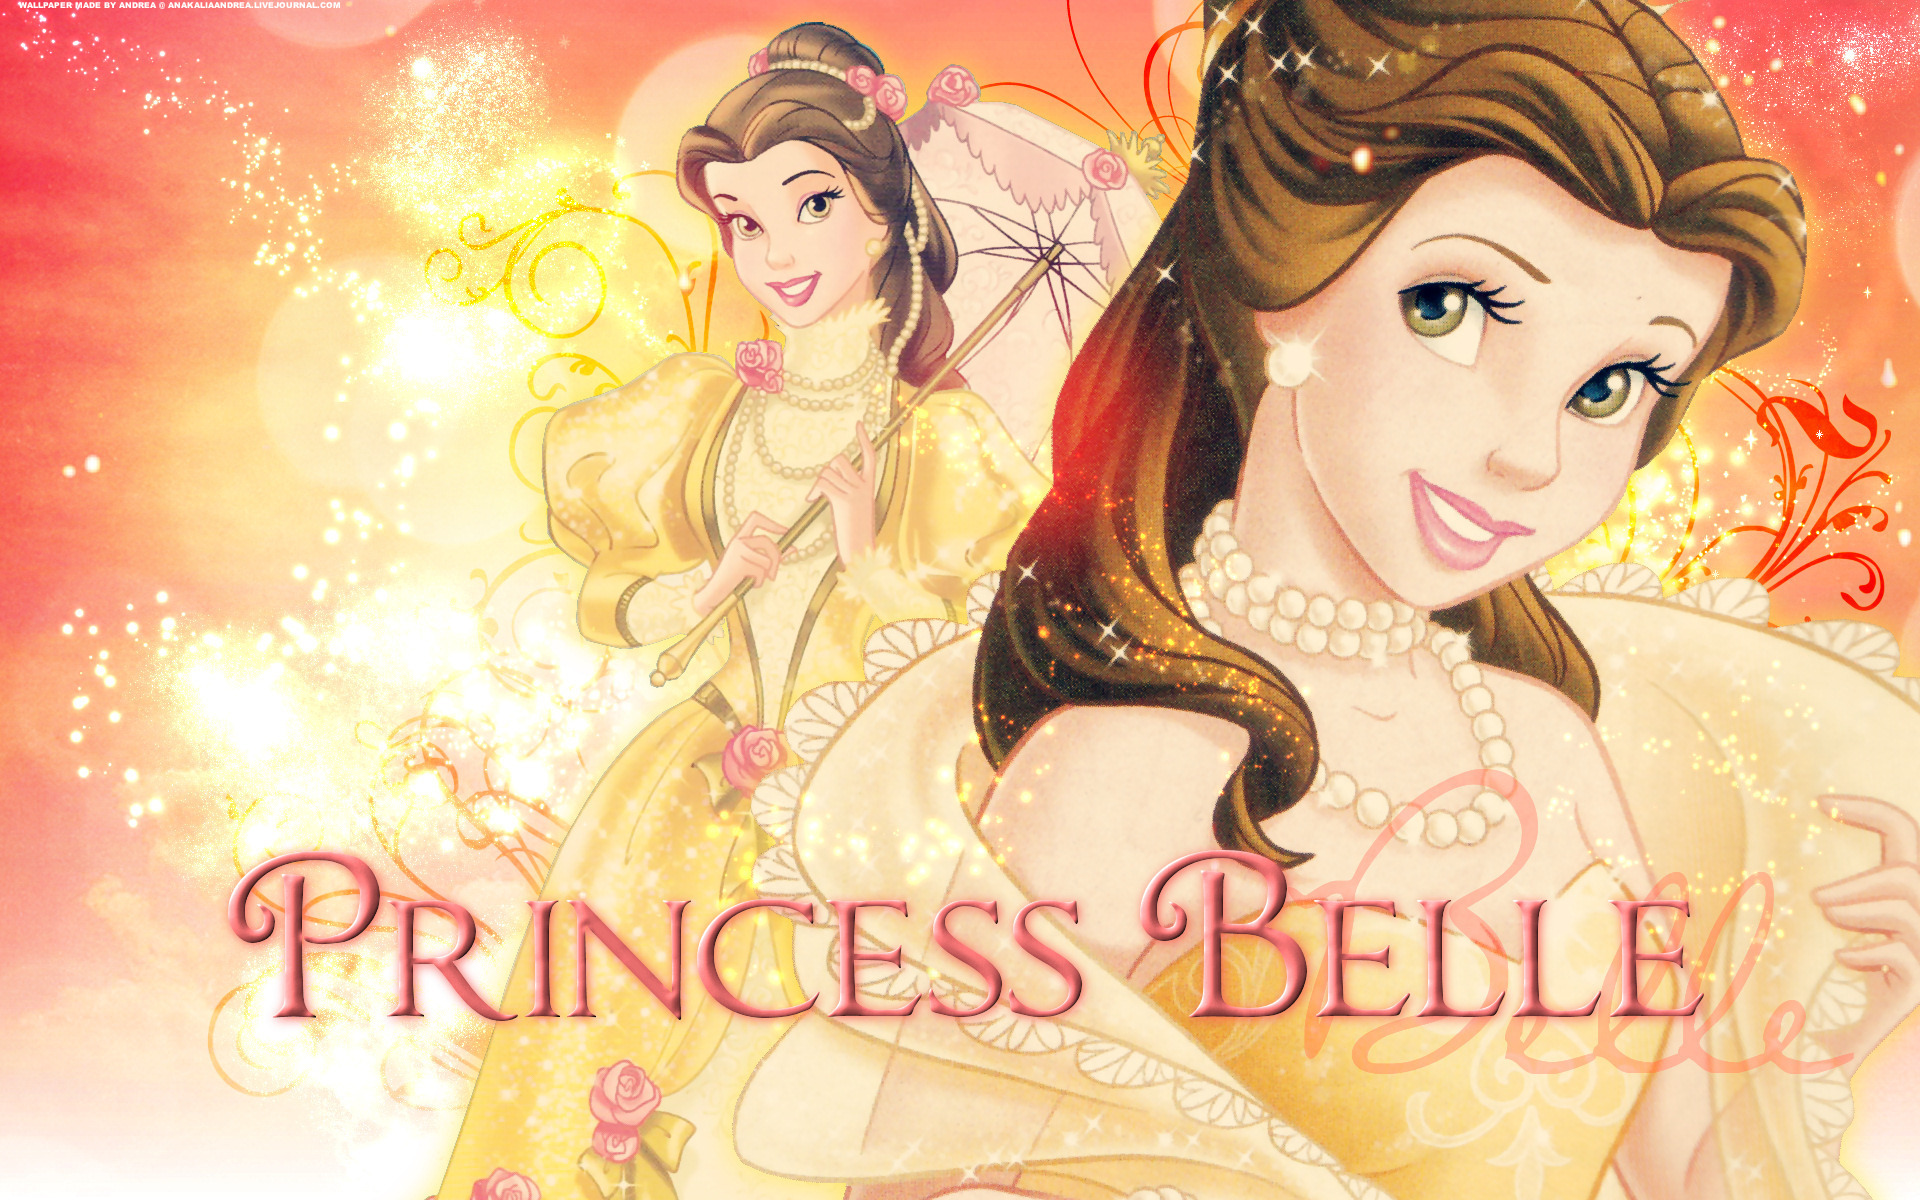 مكتبة ضخمة من صور ورمزيات اميرات ديزني Princess-Belle-disney-princess-6168646-1920-1200